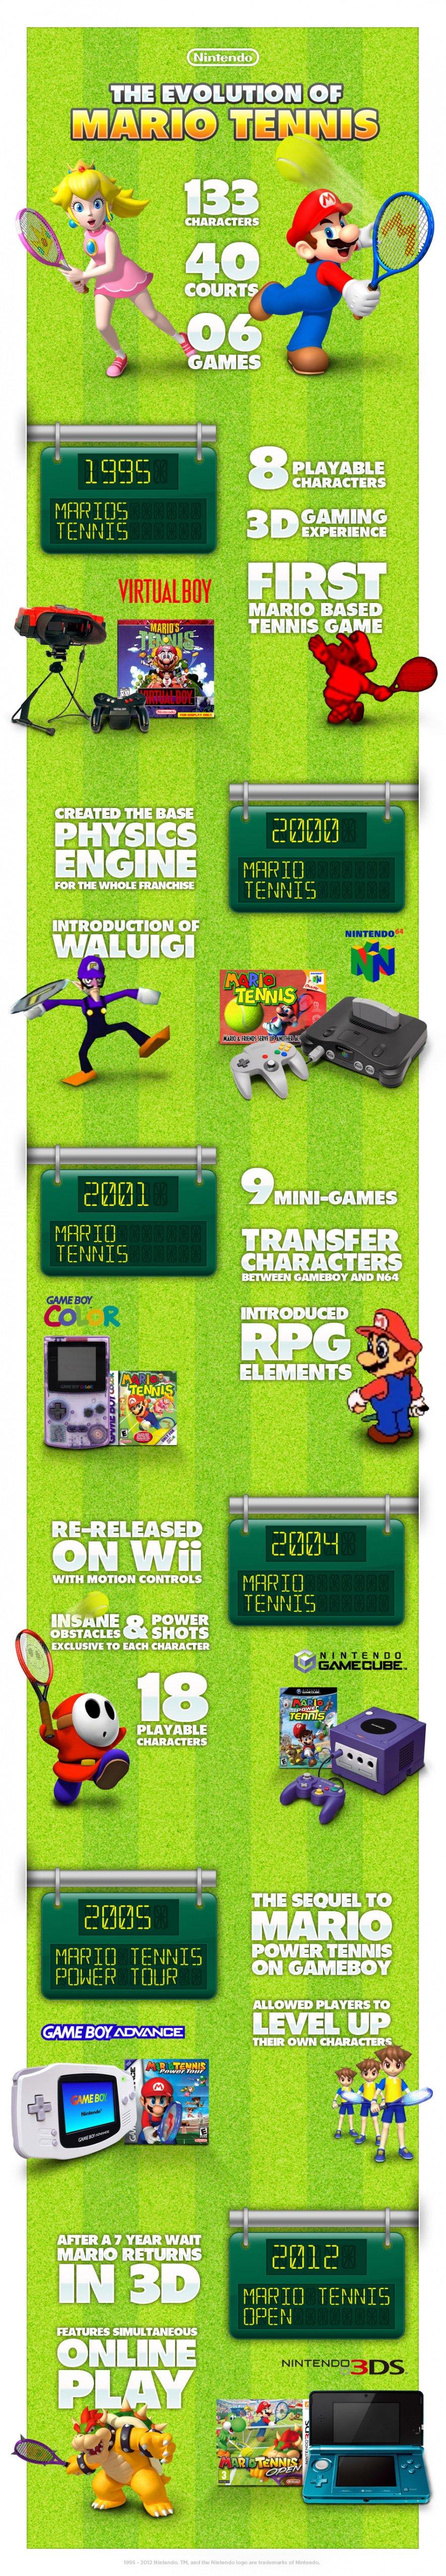 Mario Tennis Infographic FINAL